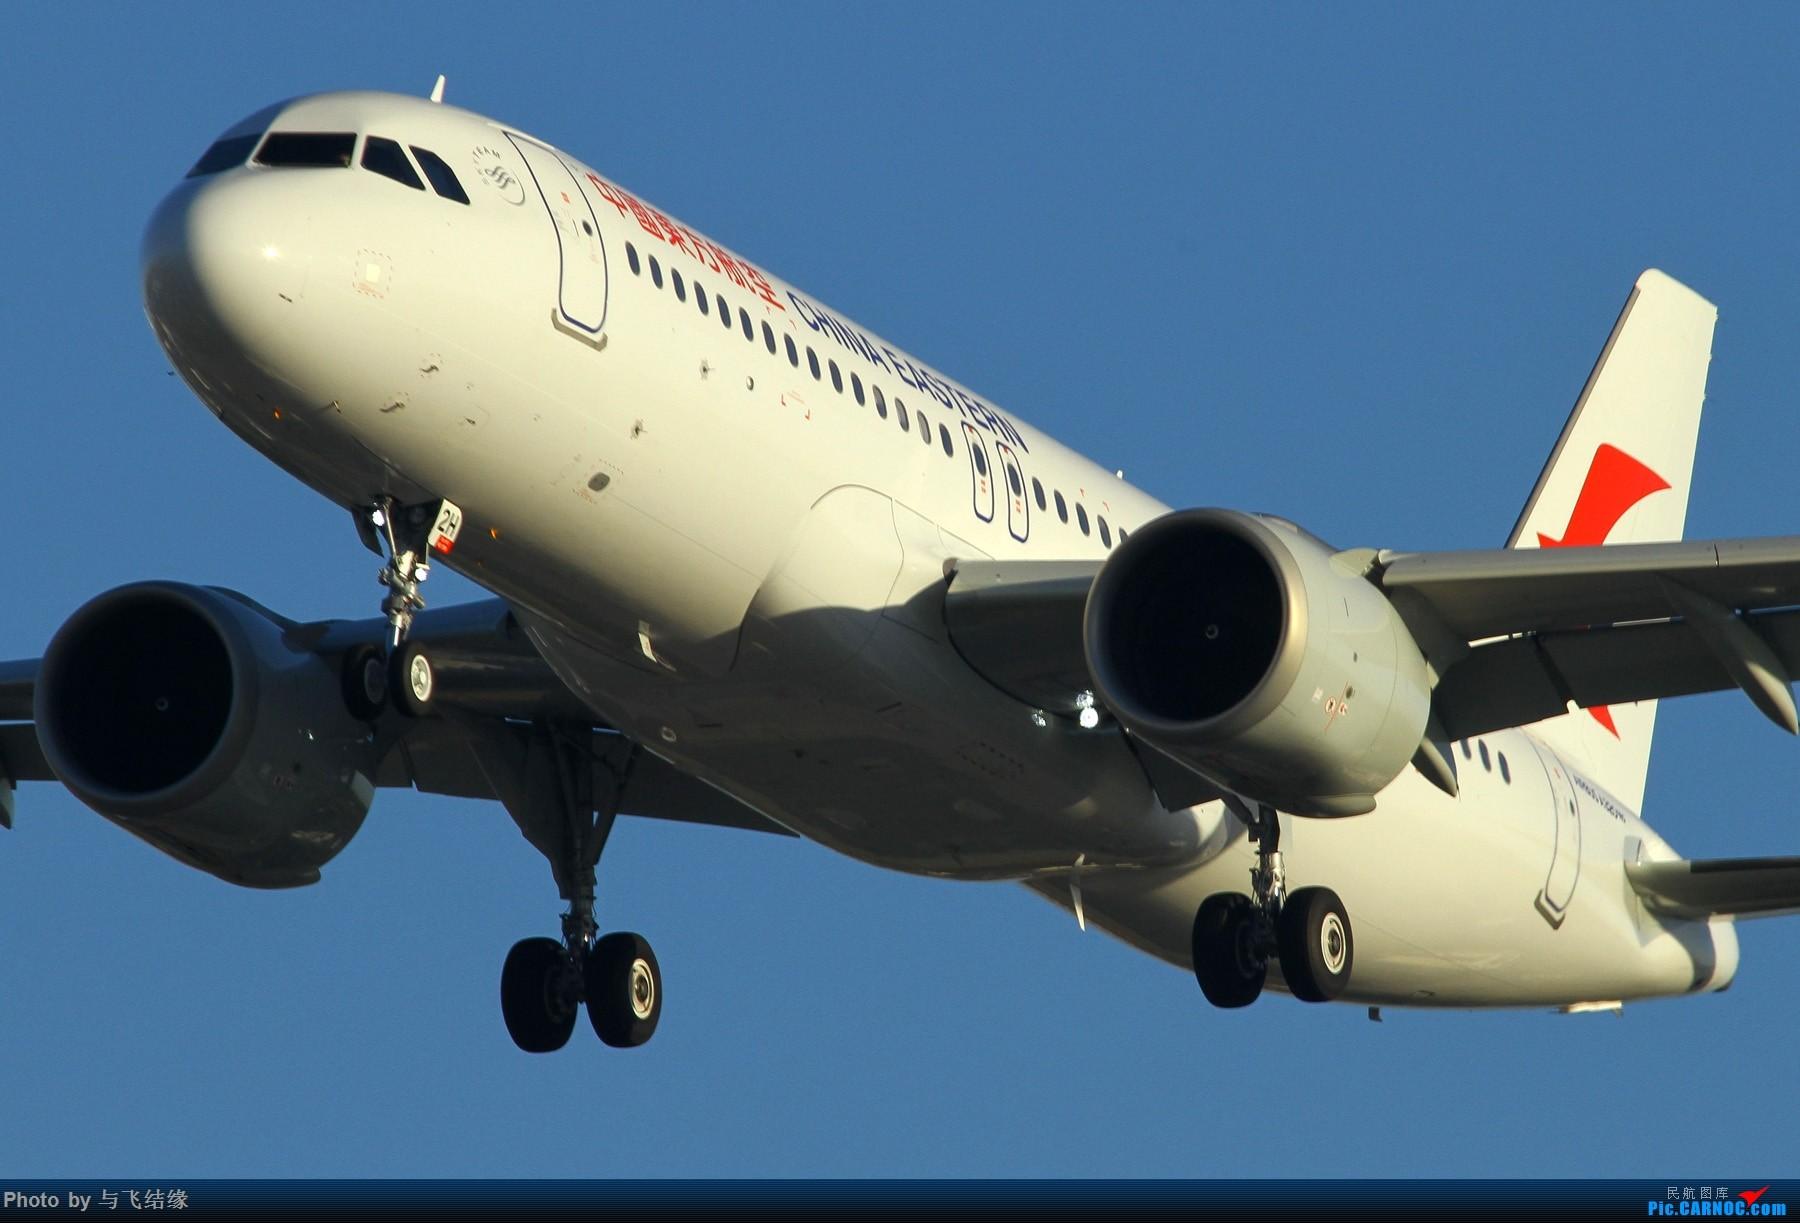 Re:[原创]东航airbus a320neo靓照一组。 AIRBUS A320NEO B-302H 中国北京首都国际机场